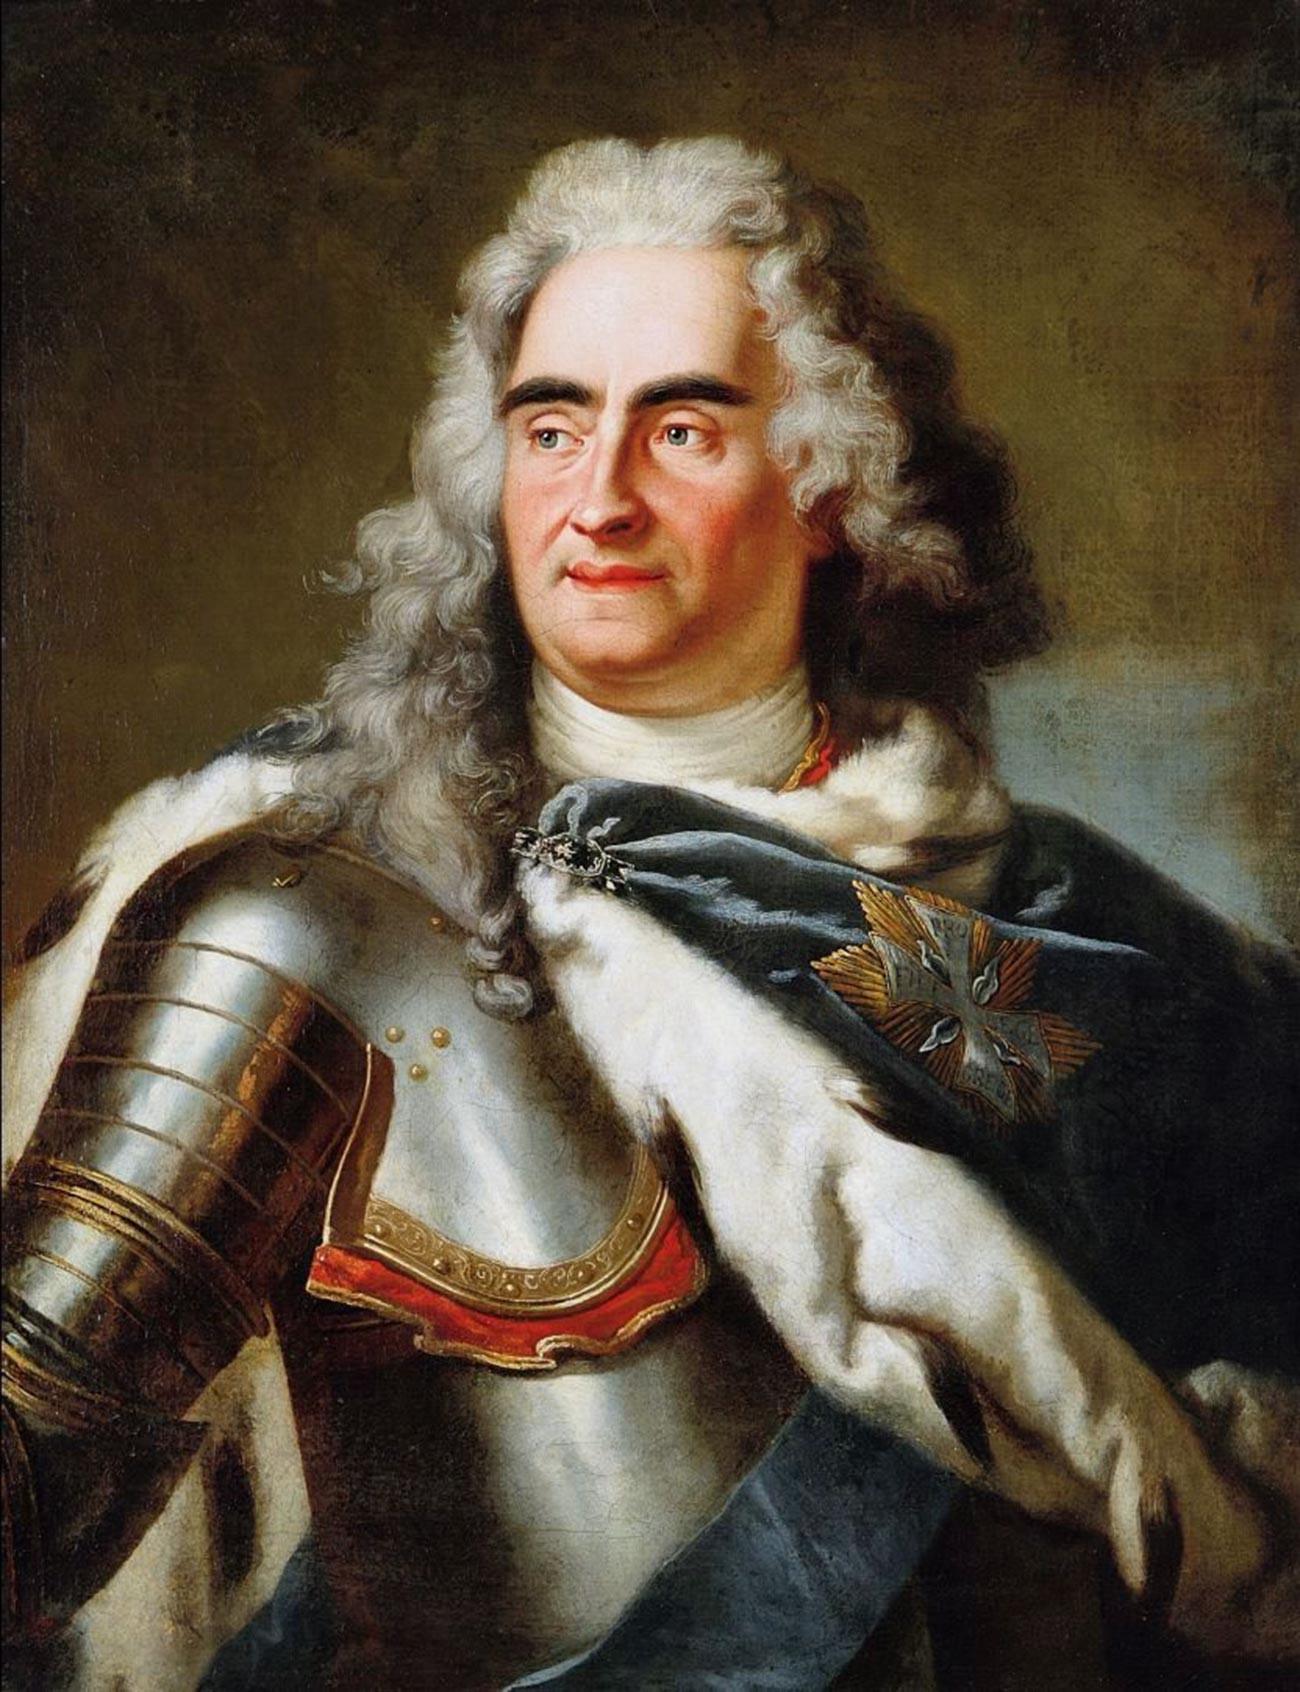 August II. stark